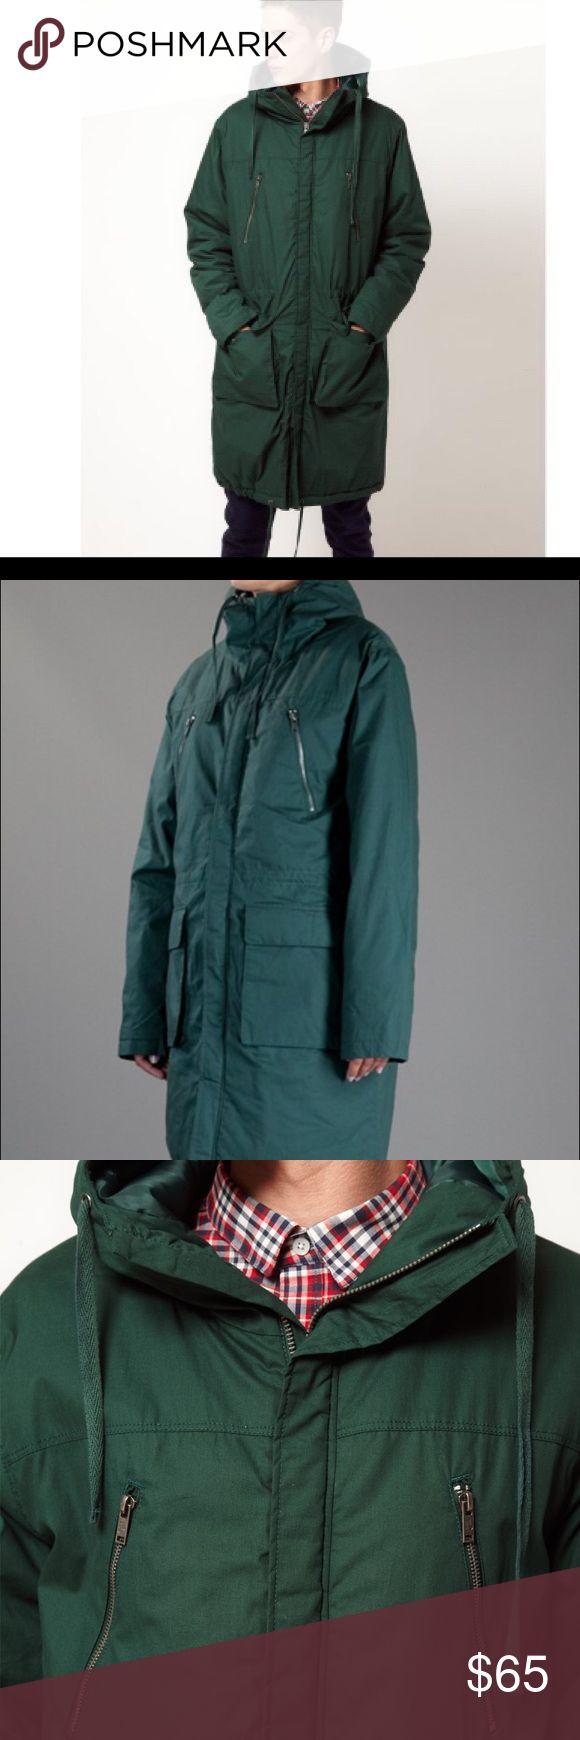 Cheap Monday Men's Anorak Coat Cheap Monday Men's Anorak Coat in green Cheap Monday Jackets & Coats Trench Coats